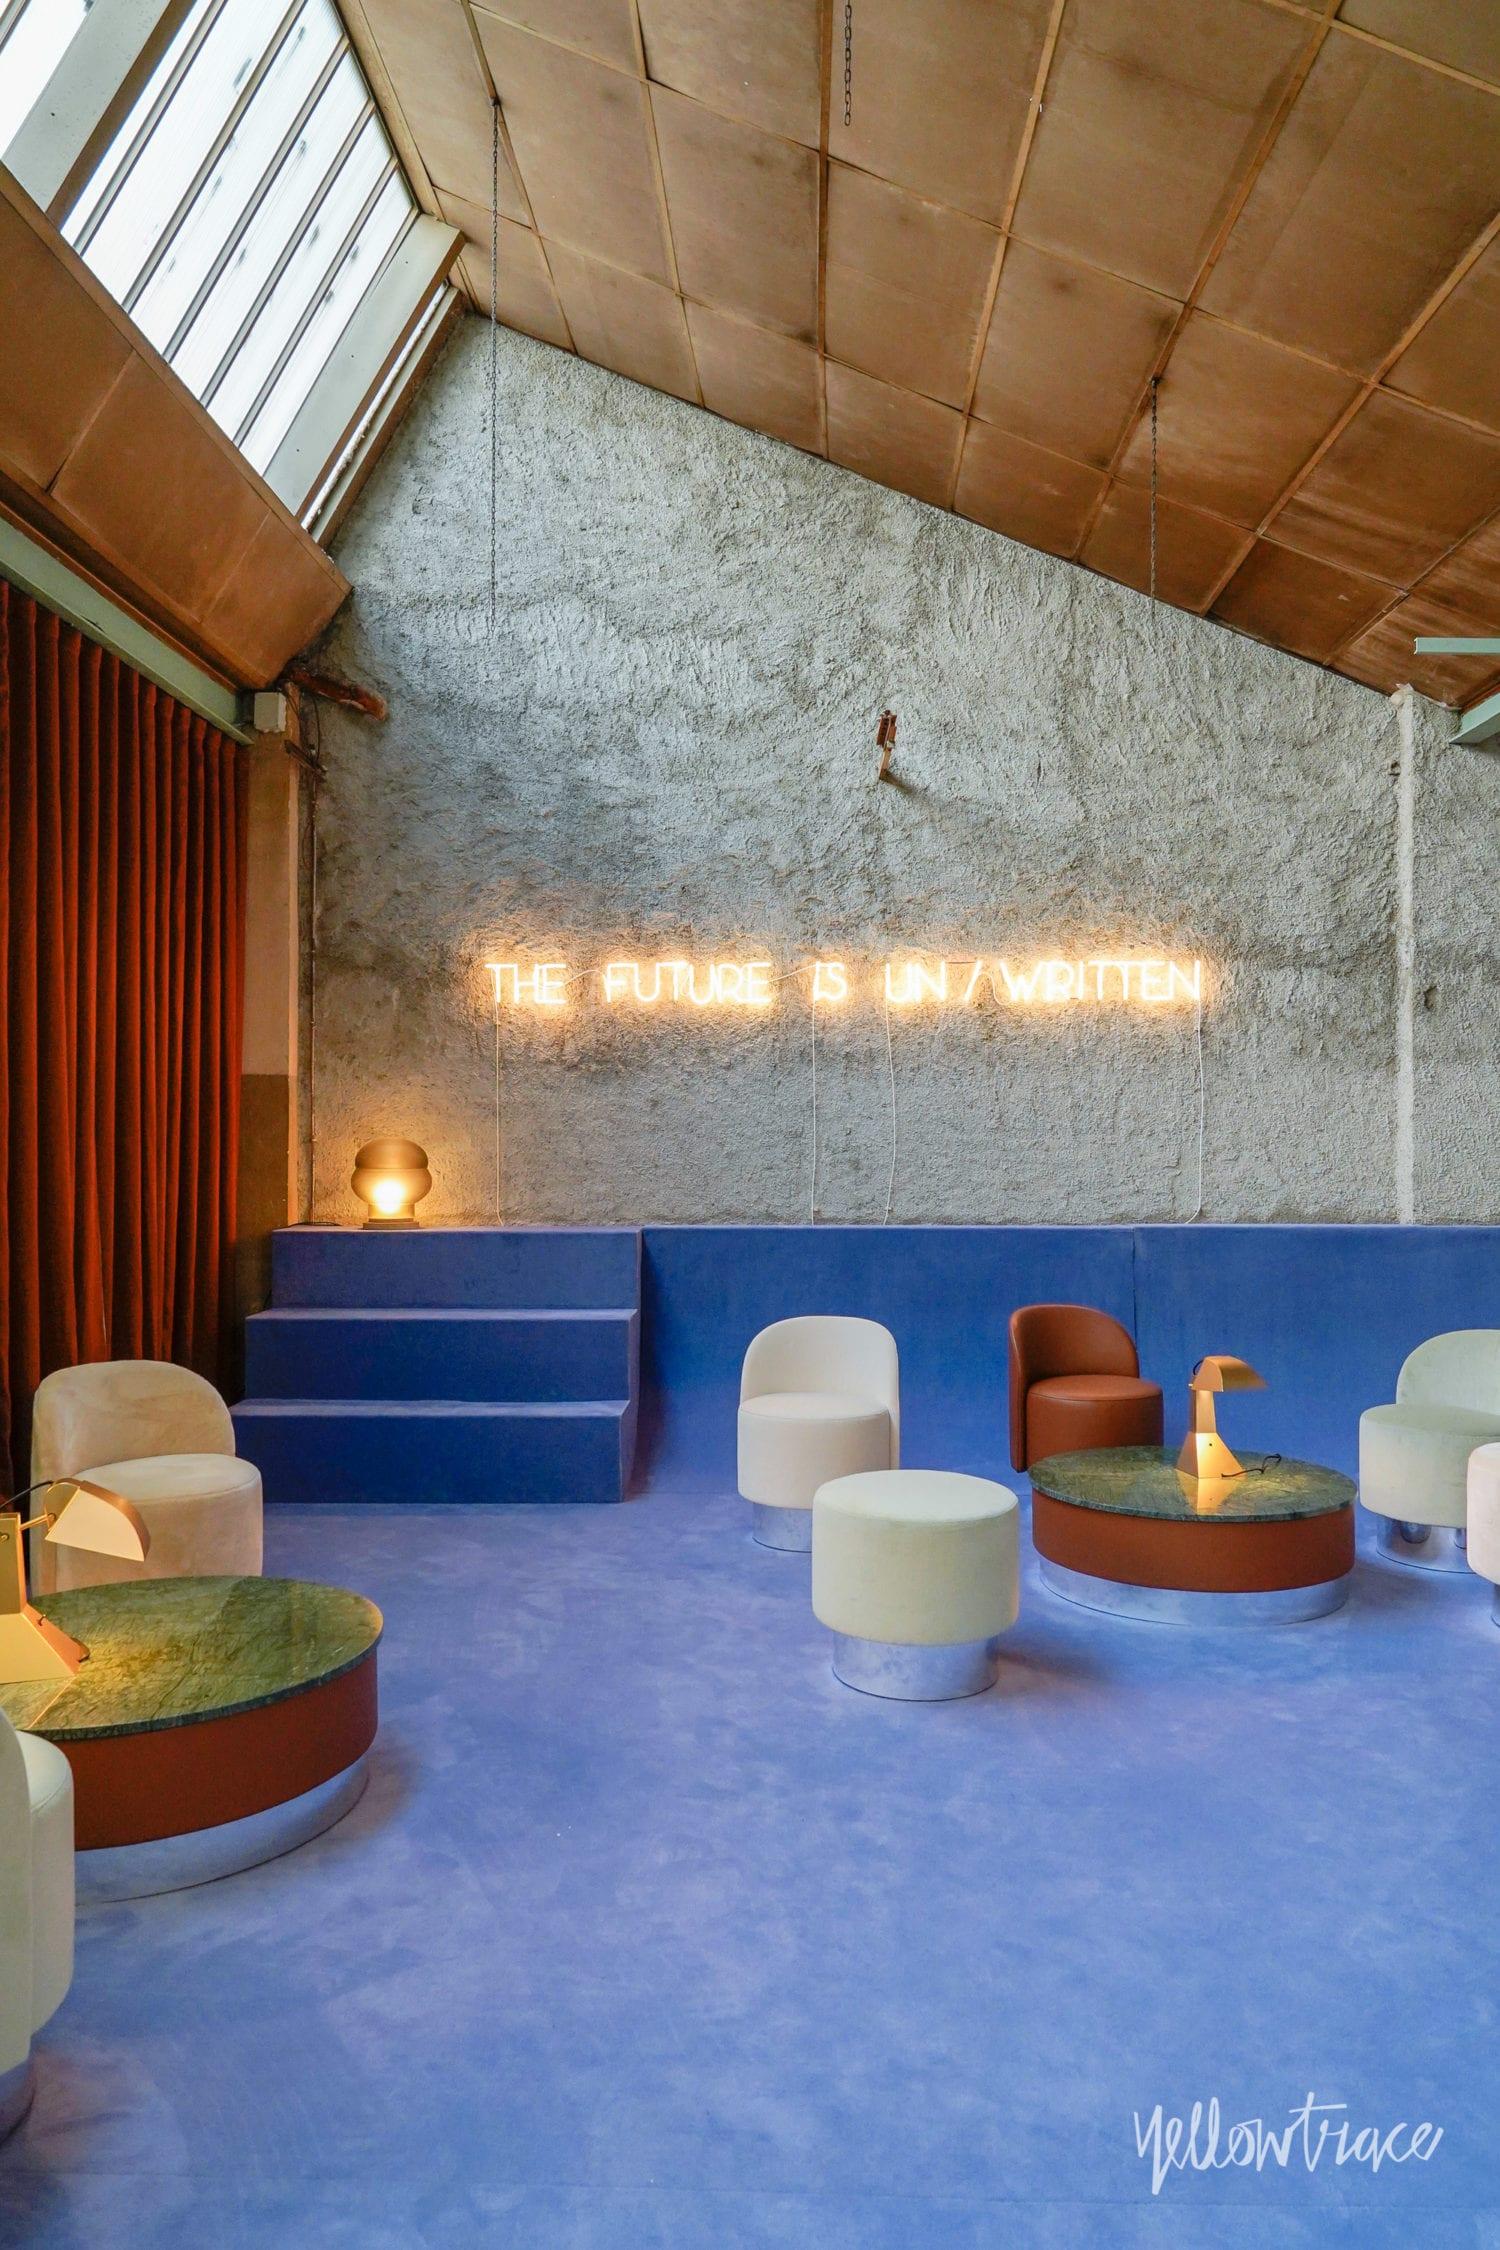 Les Arcanistes Studiopepe At Milan Design Week 2019 Photo Nick Hughes Yellowtrace 19